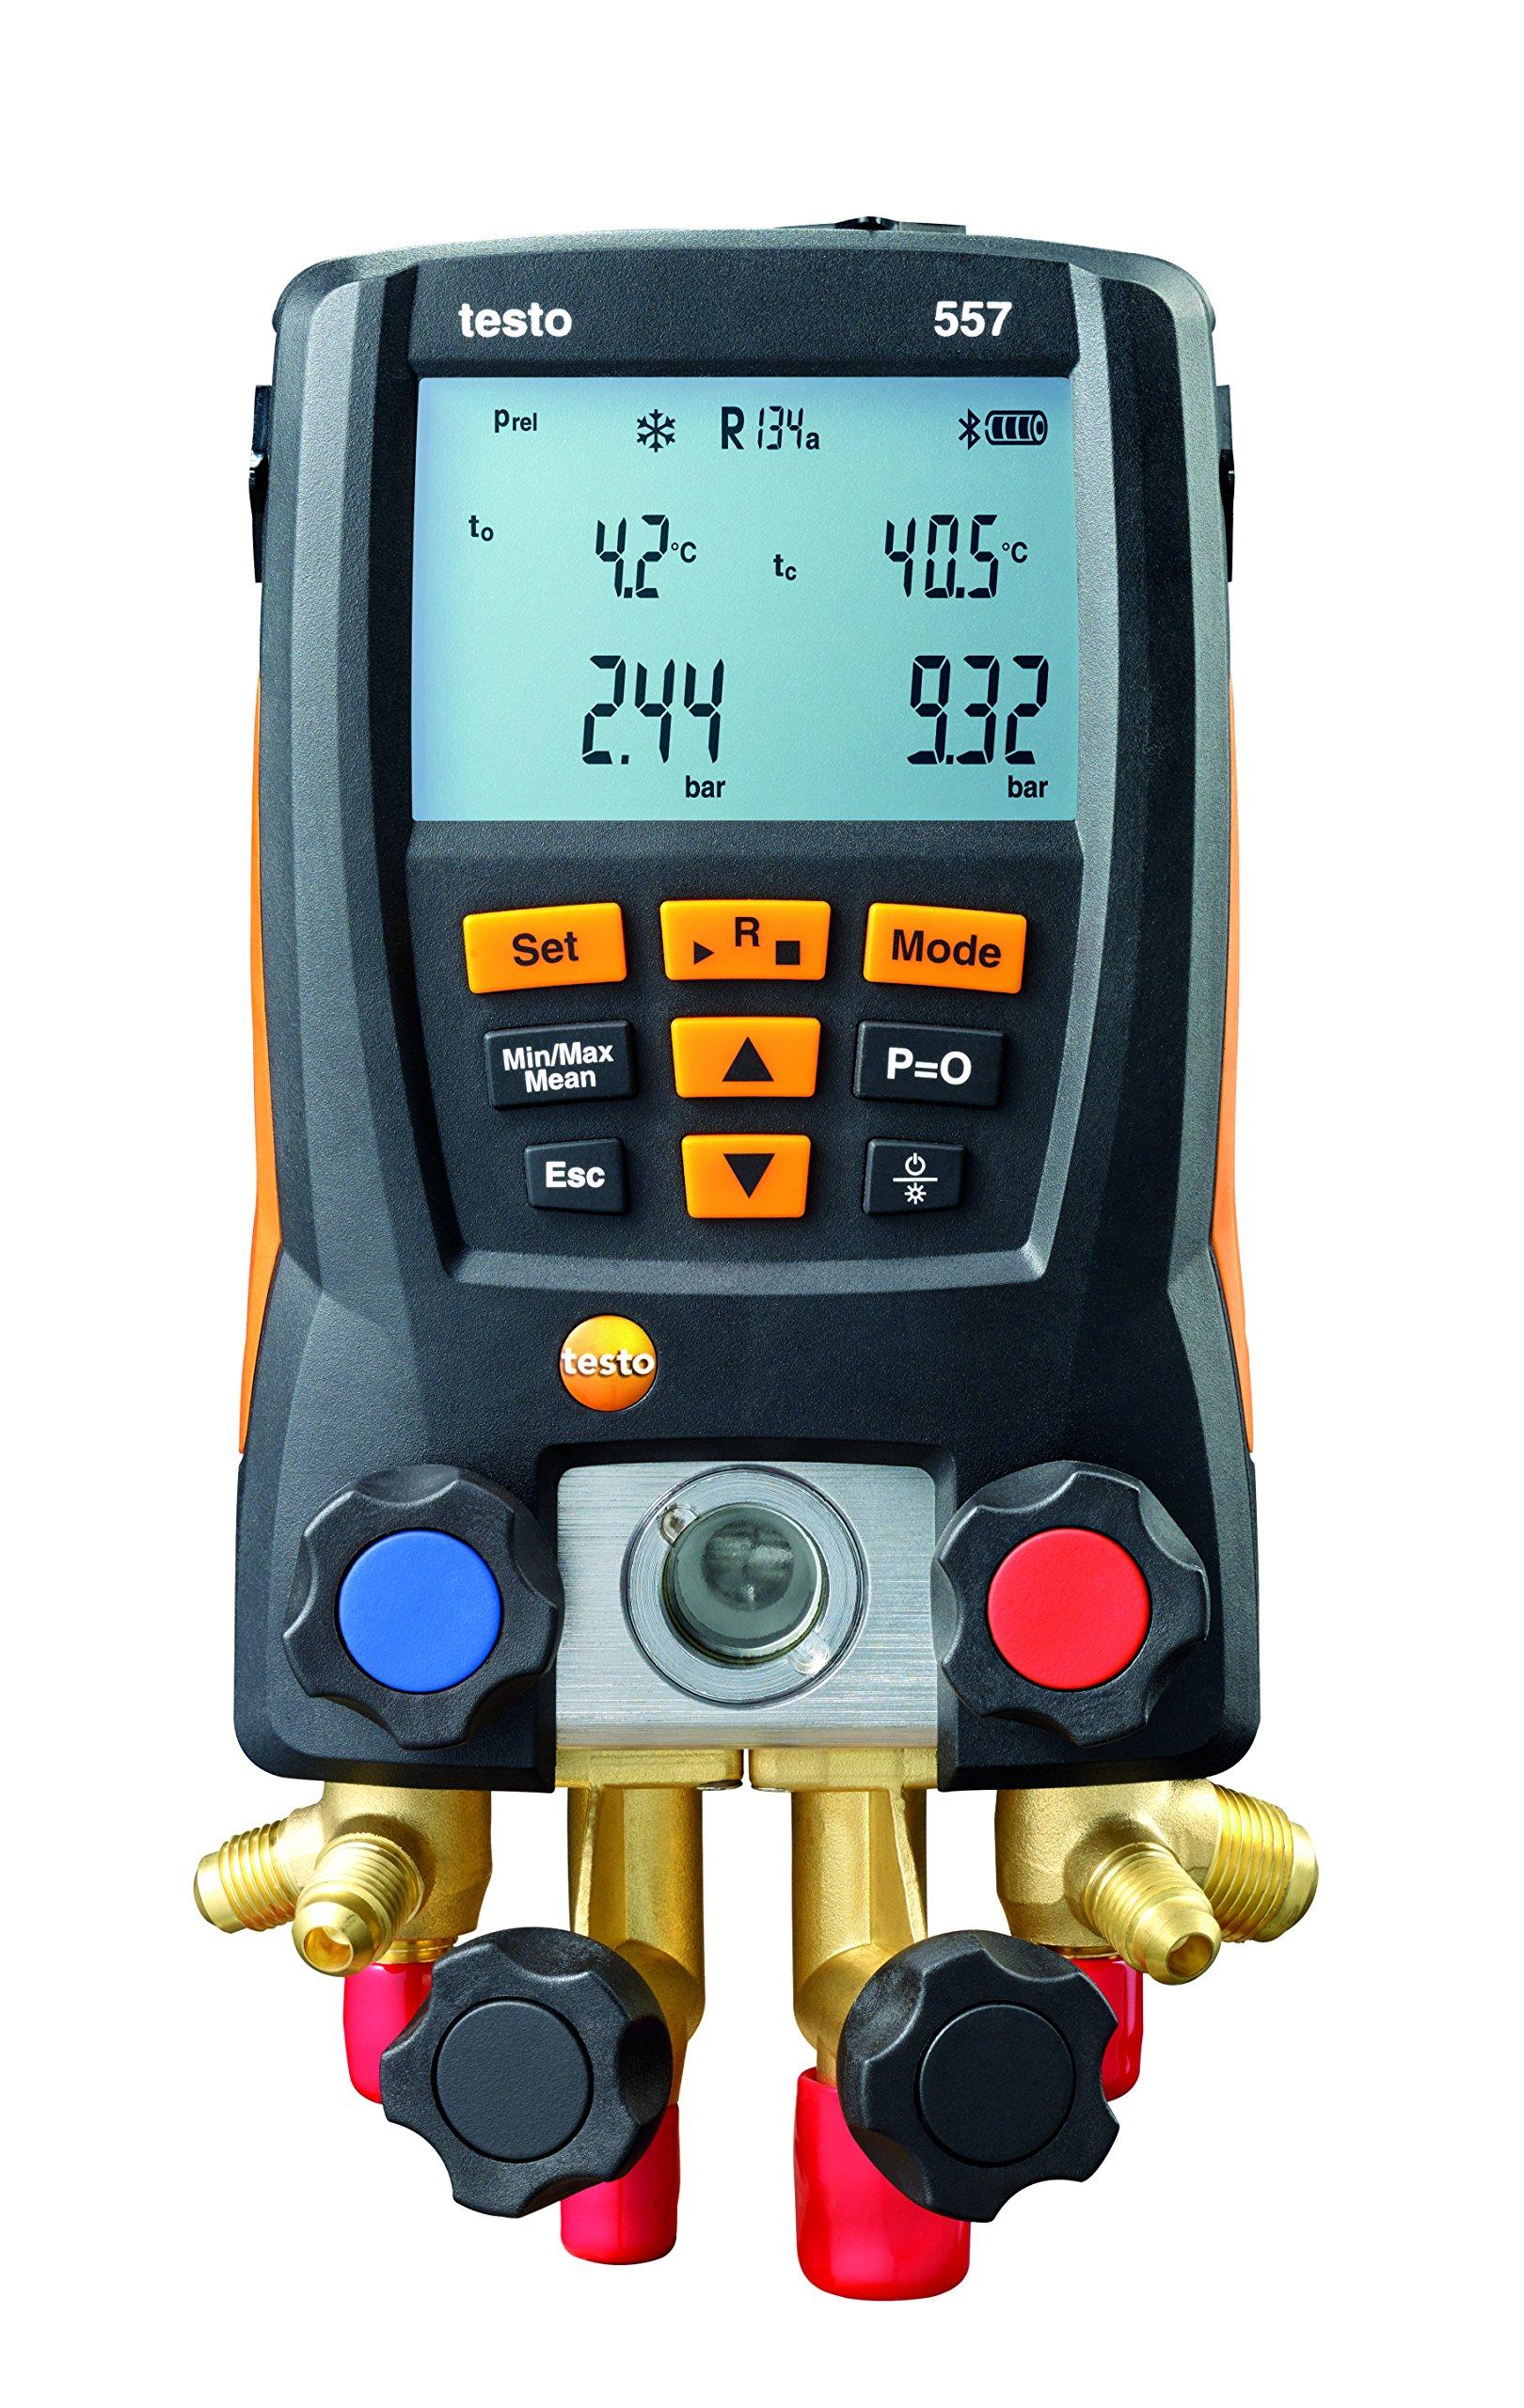 Testo 0563 1557 557 4 Way Valve Digital Manifold Meter Kit with Built in Bluetooth, 3'' Height, 5'' Width, 9'' Length